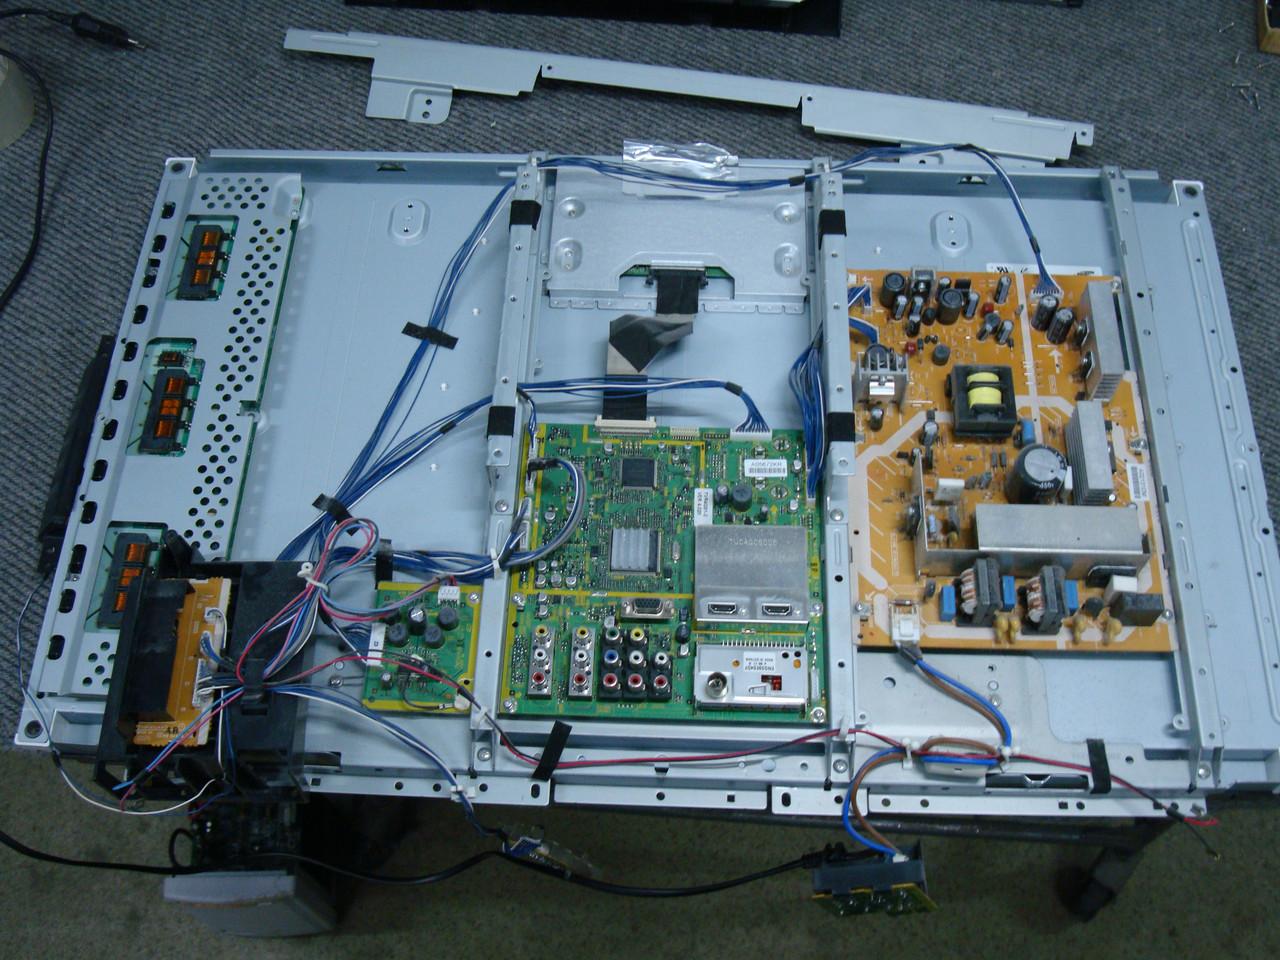 Запчасти к телевизору Panasonic TX-R32LE8 (TNP4G431, TNP4G433, 320AA03C2LV0.0, INV32S12M REV 0.5)